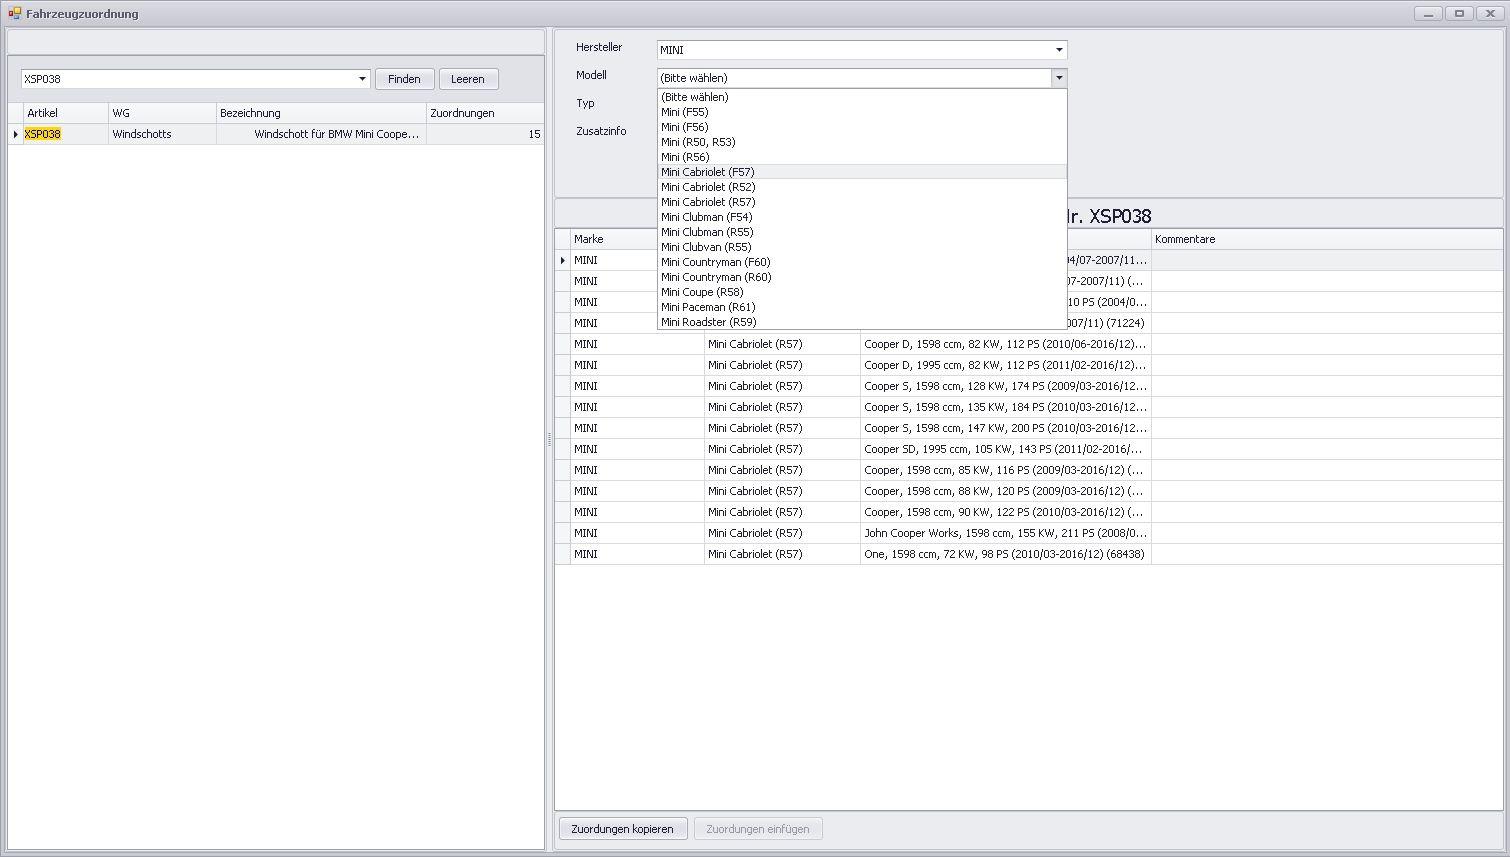 Fahrzeugzuordnung mit HSN/TSN Schlüsselnummern